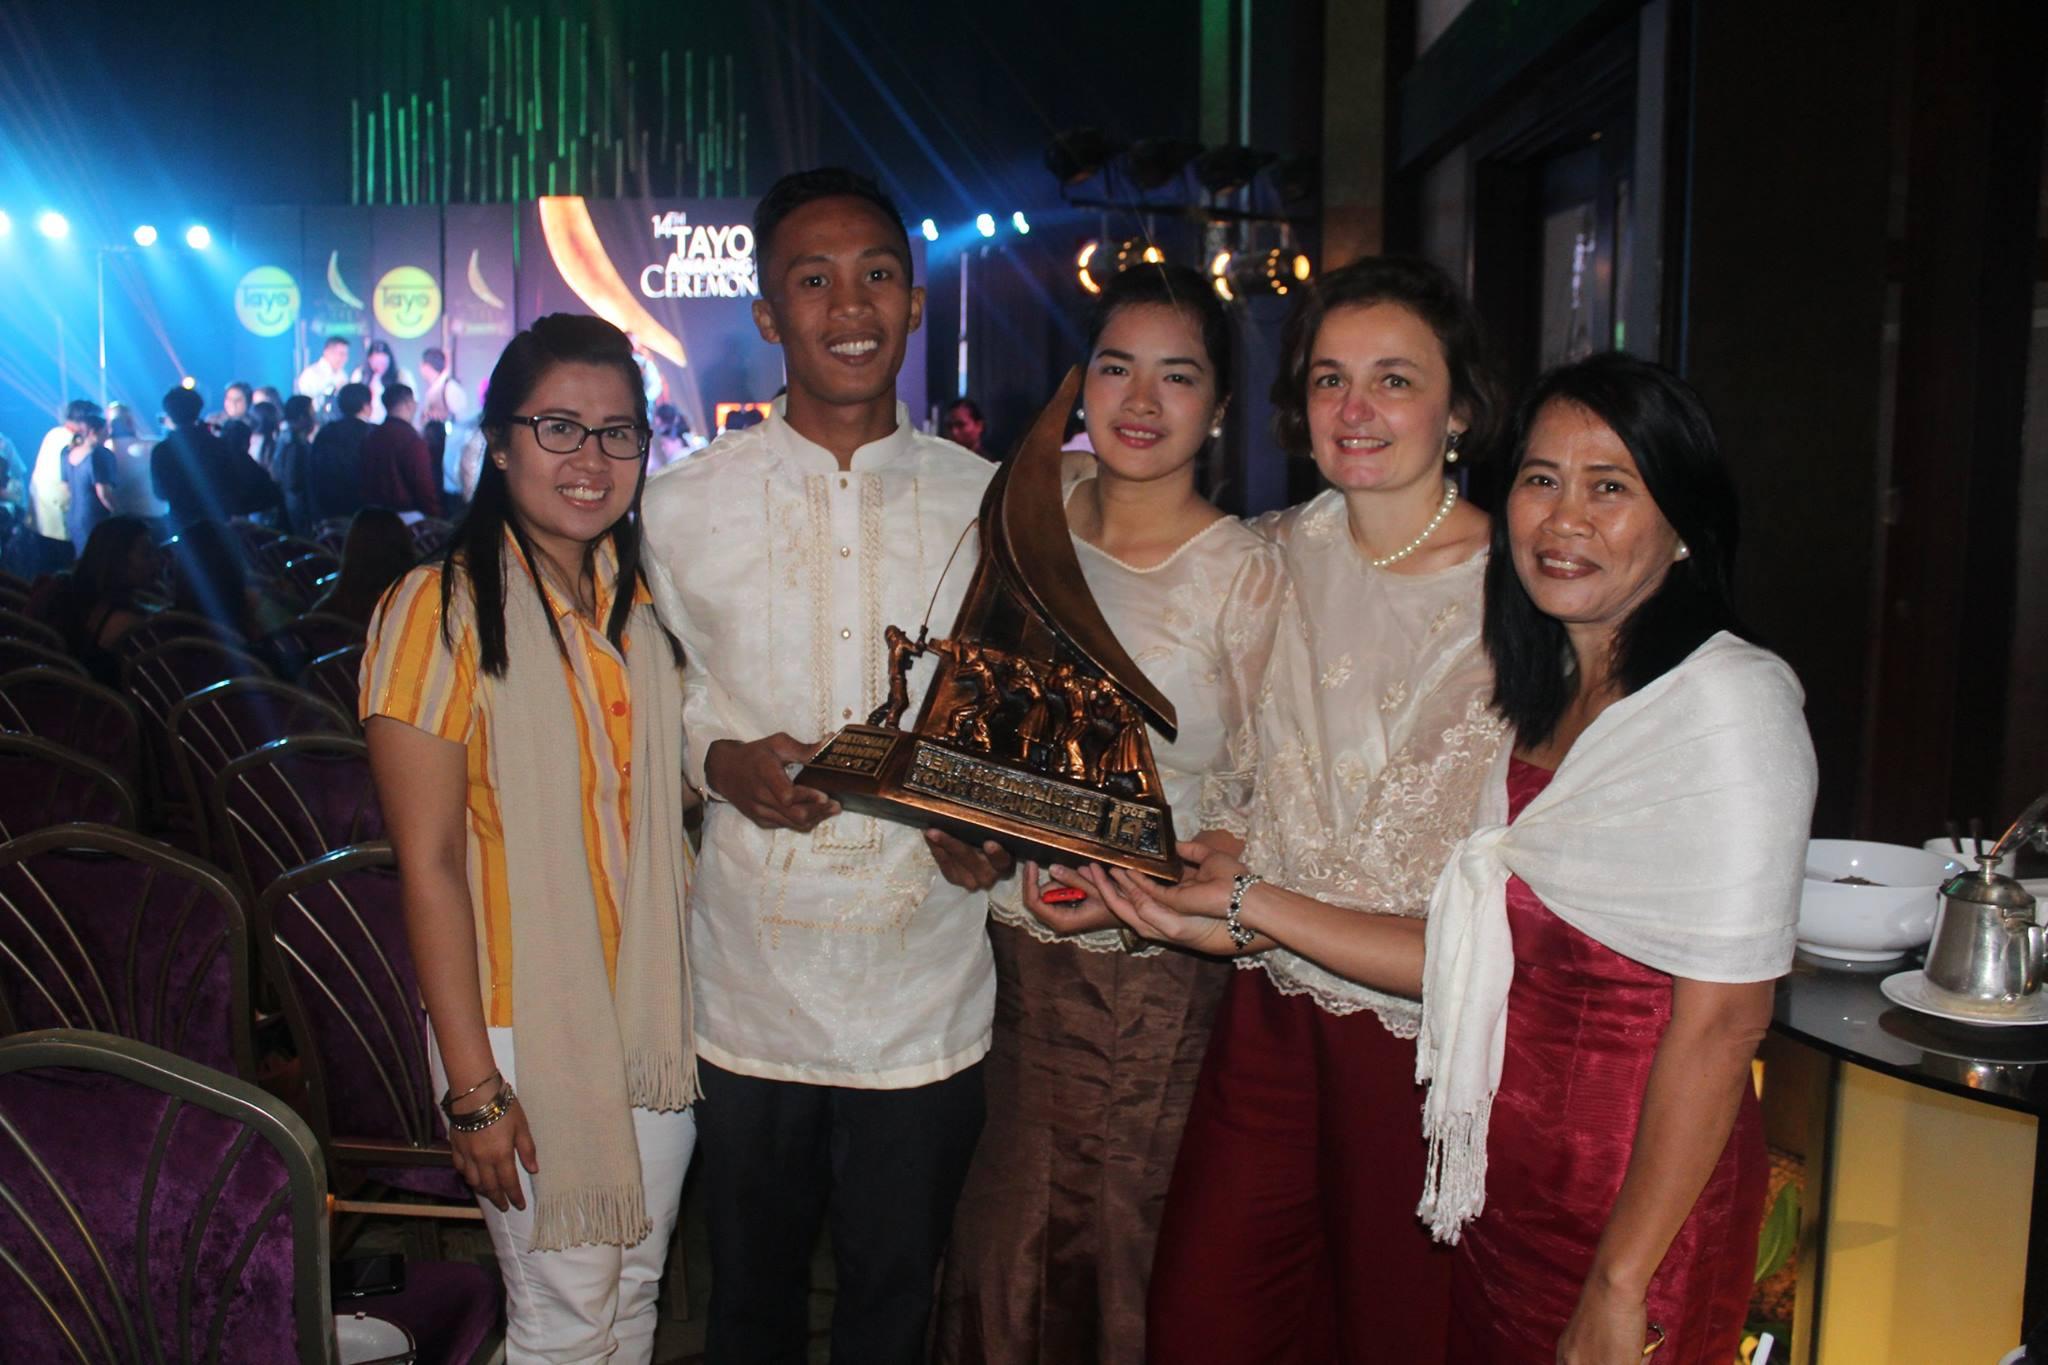 Les jeunes Ambassadeurs des droits de l'Enfant GAGNENT les TAYO Awards !